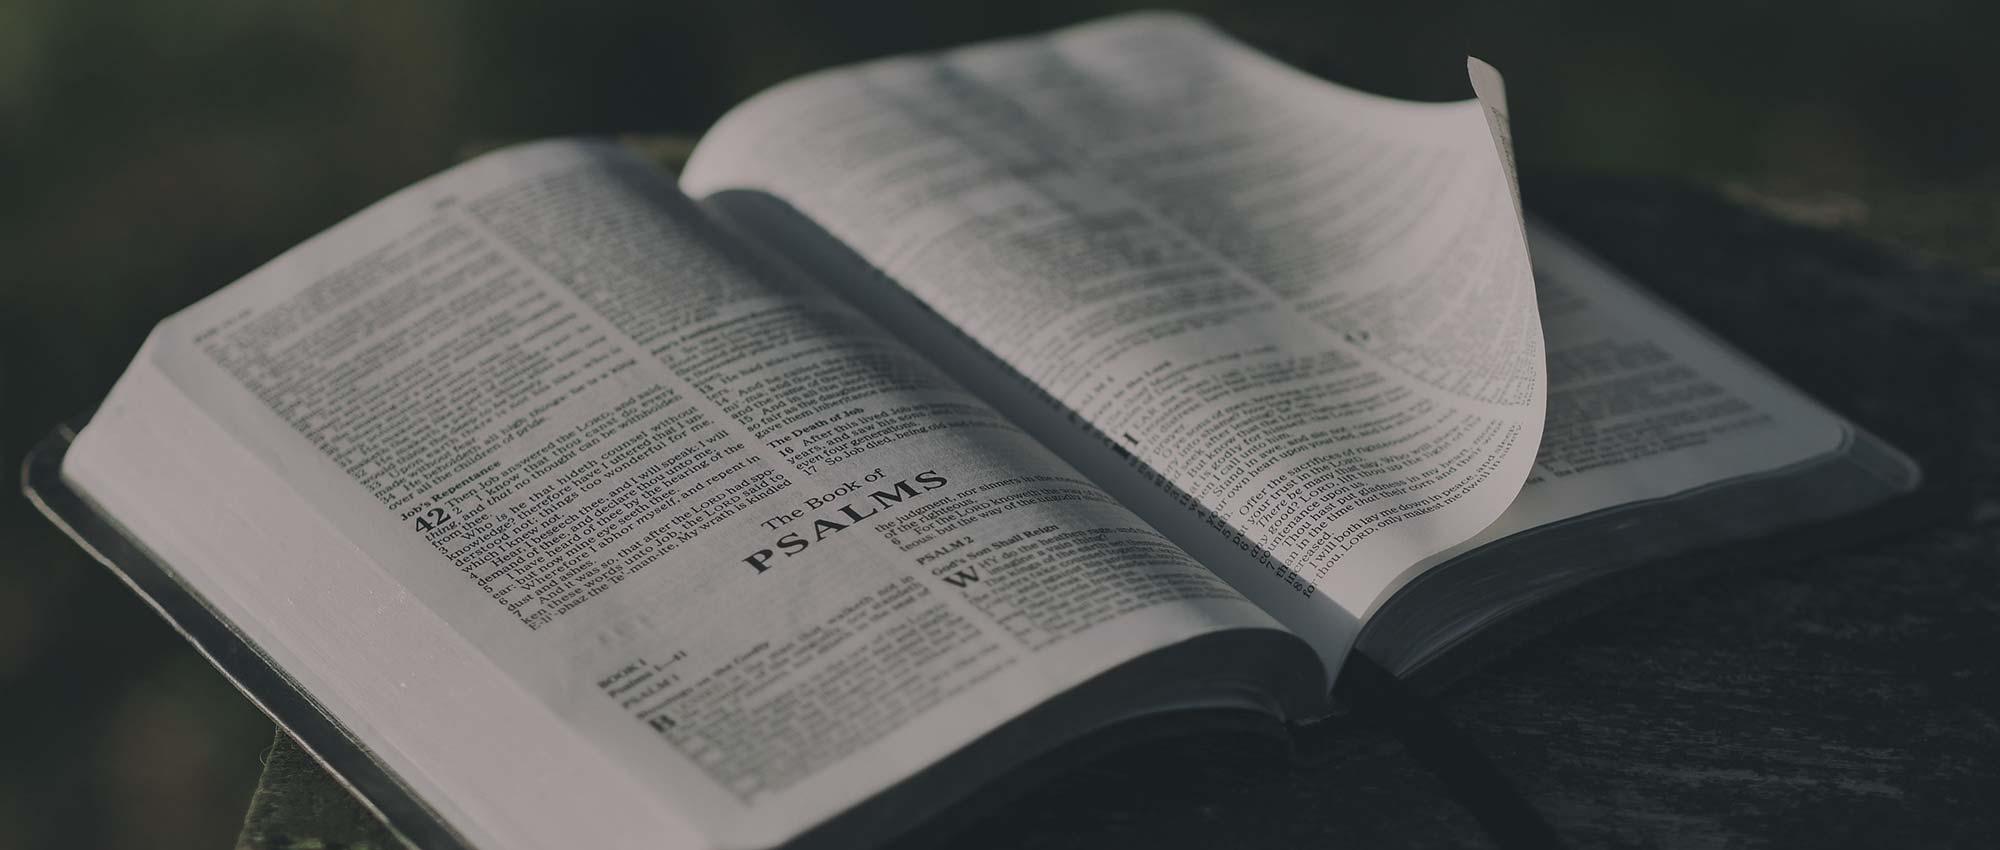 Praying The Bible A Framework For Unity Ihopkc Blog